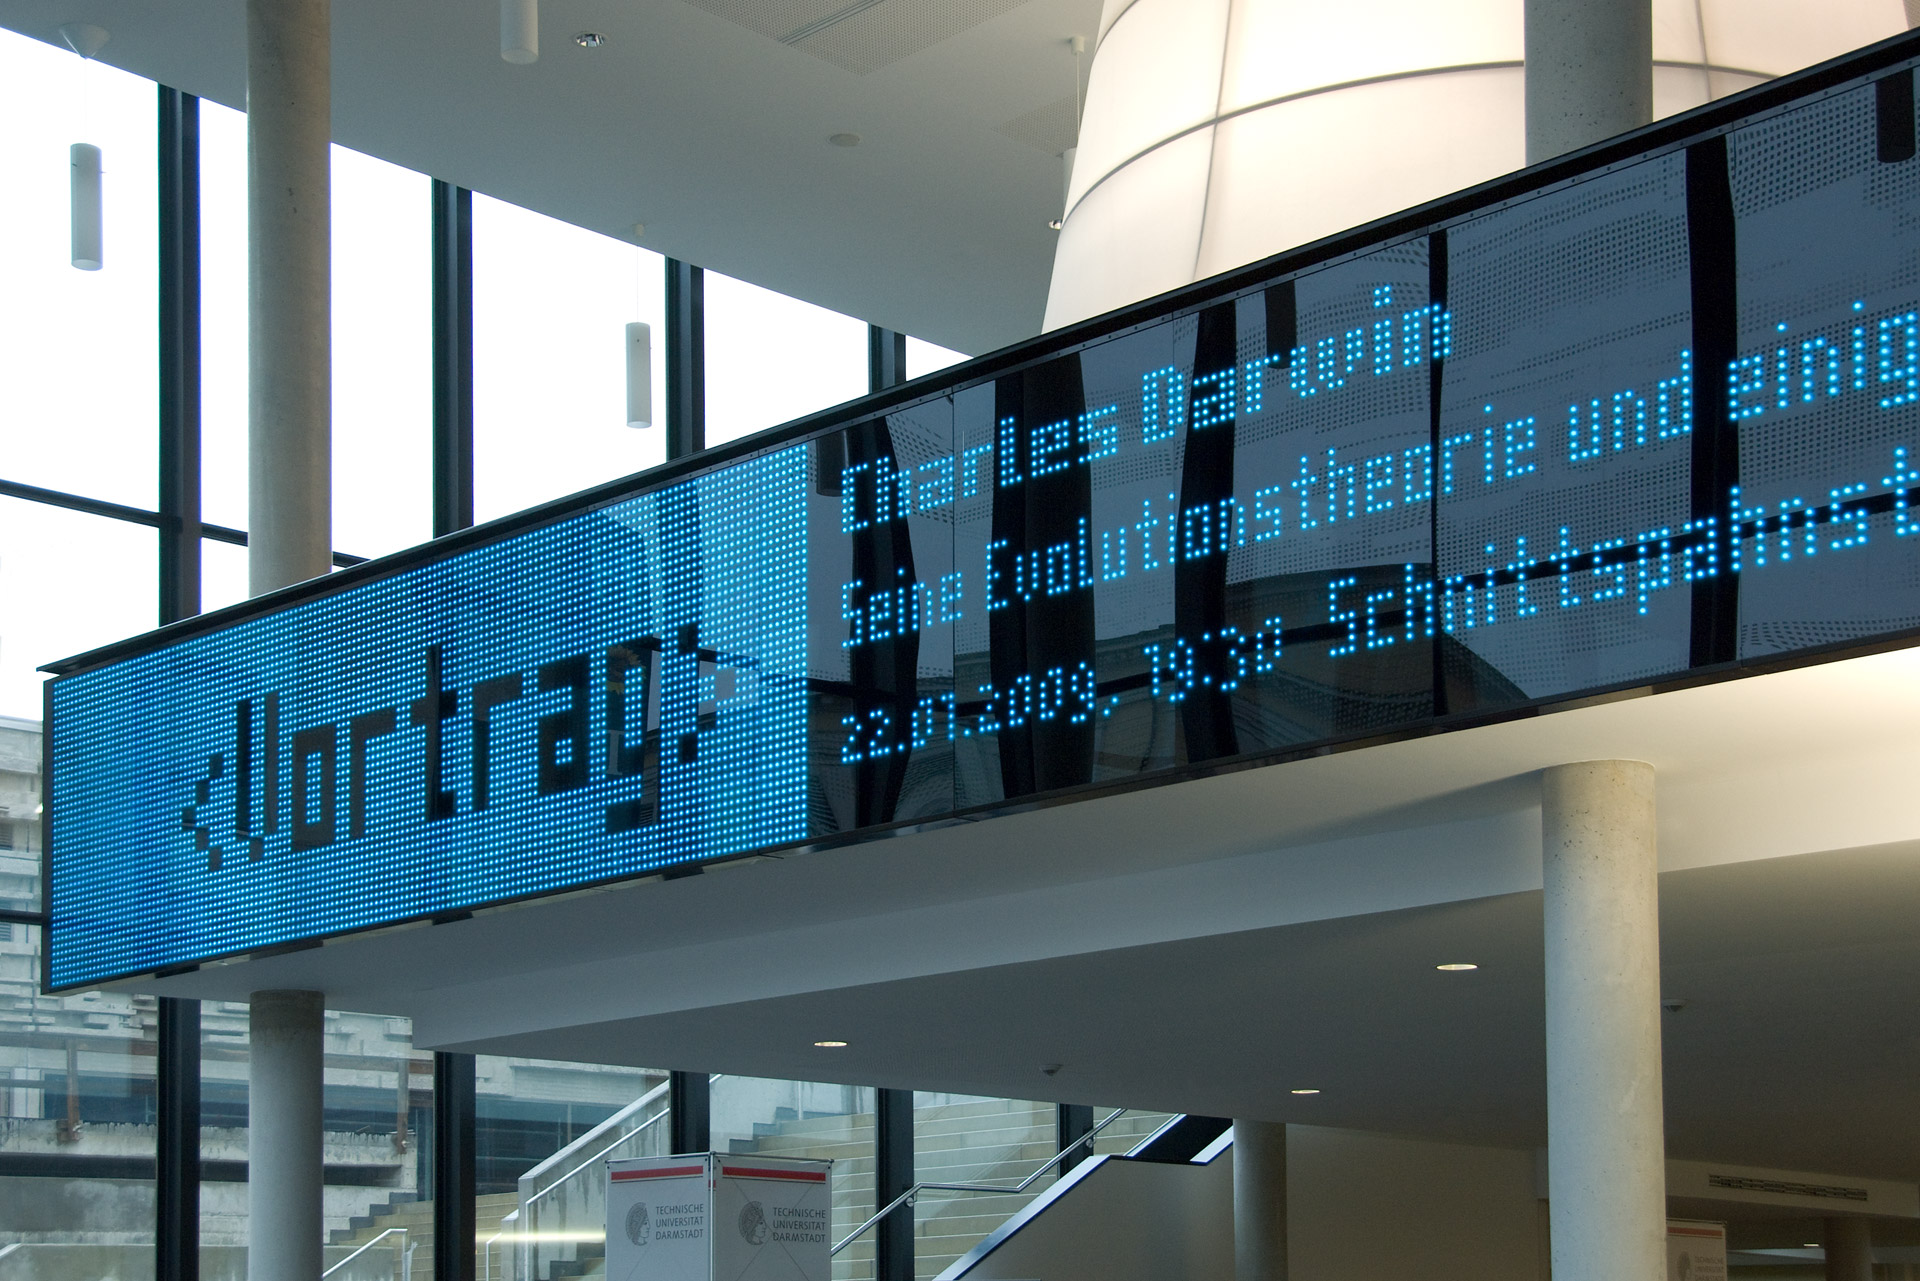 <strong>Technische Universität Darmstadt</strong><br>Karo5